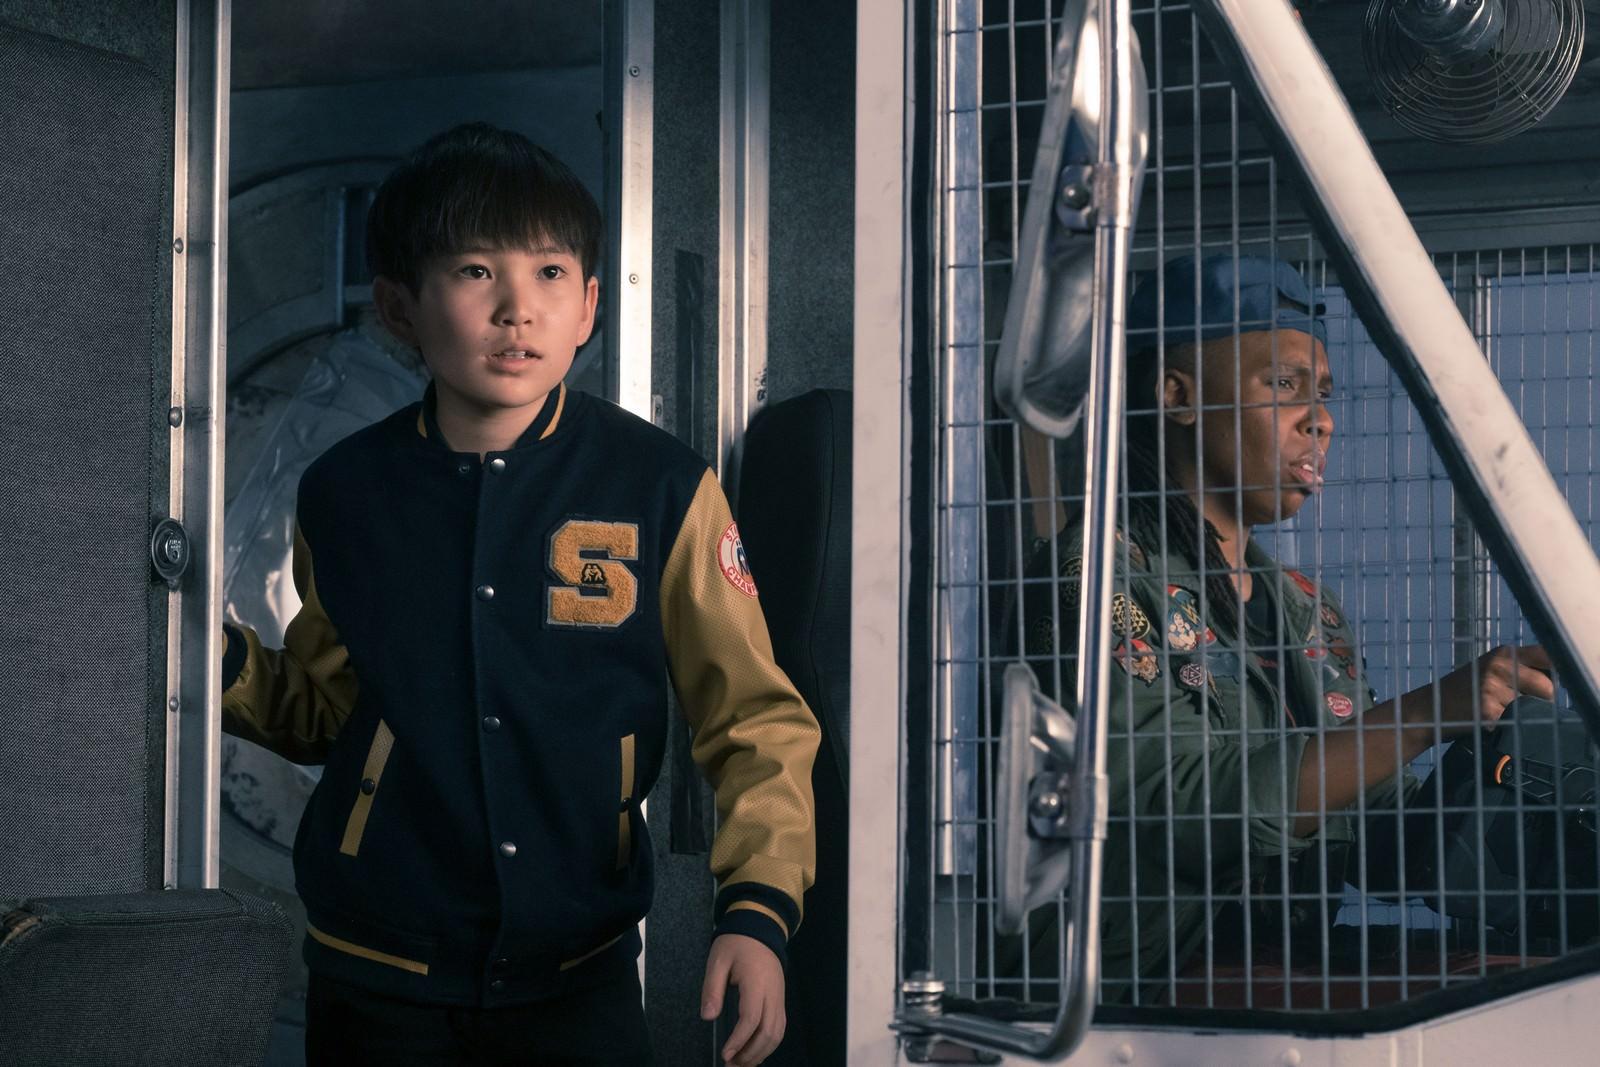 Movie, Ready Player One(美國) / 一級玩家(台) / 头号玩家(中) / 挑戰者1號(港), 電影劇照